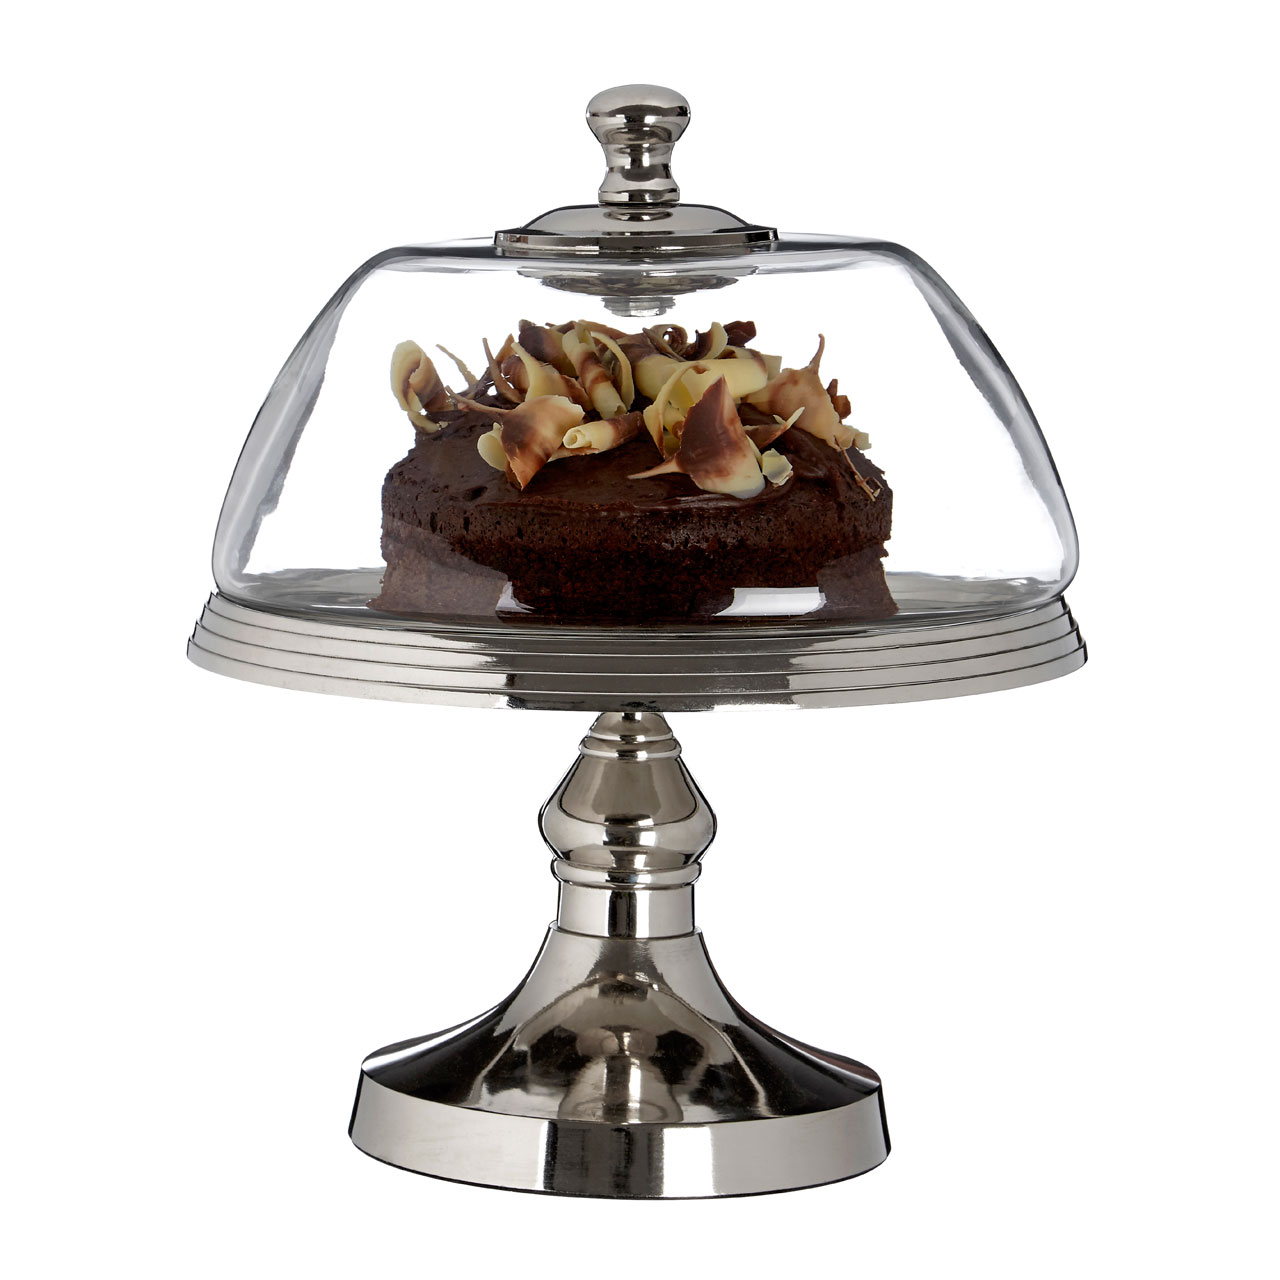 cake stand metal base glass dome silver ebay. Black Bedroom Furniture Sets. Home Design Ideas